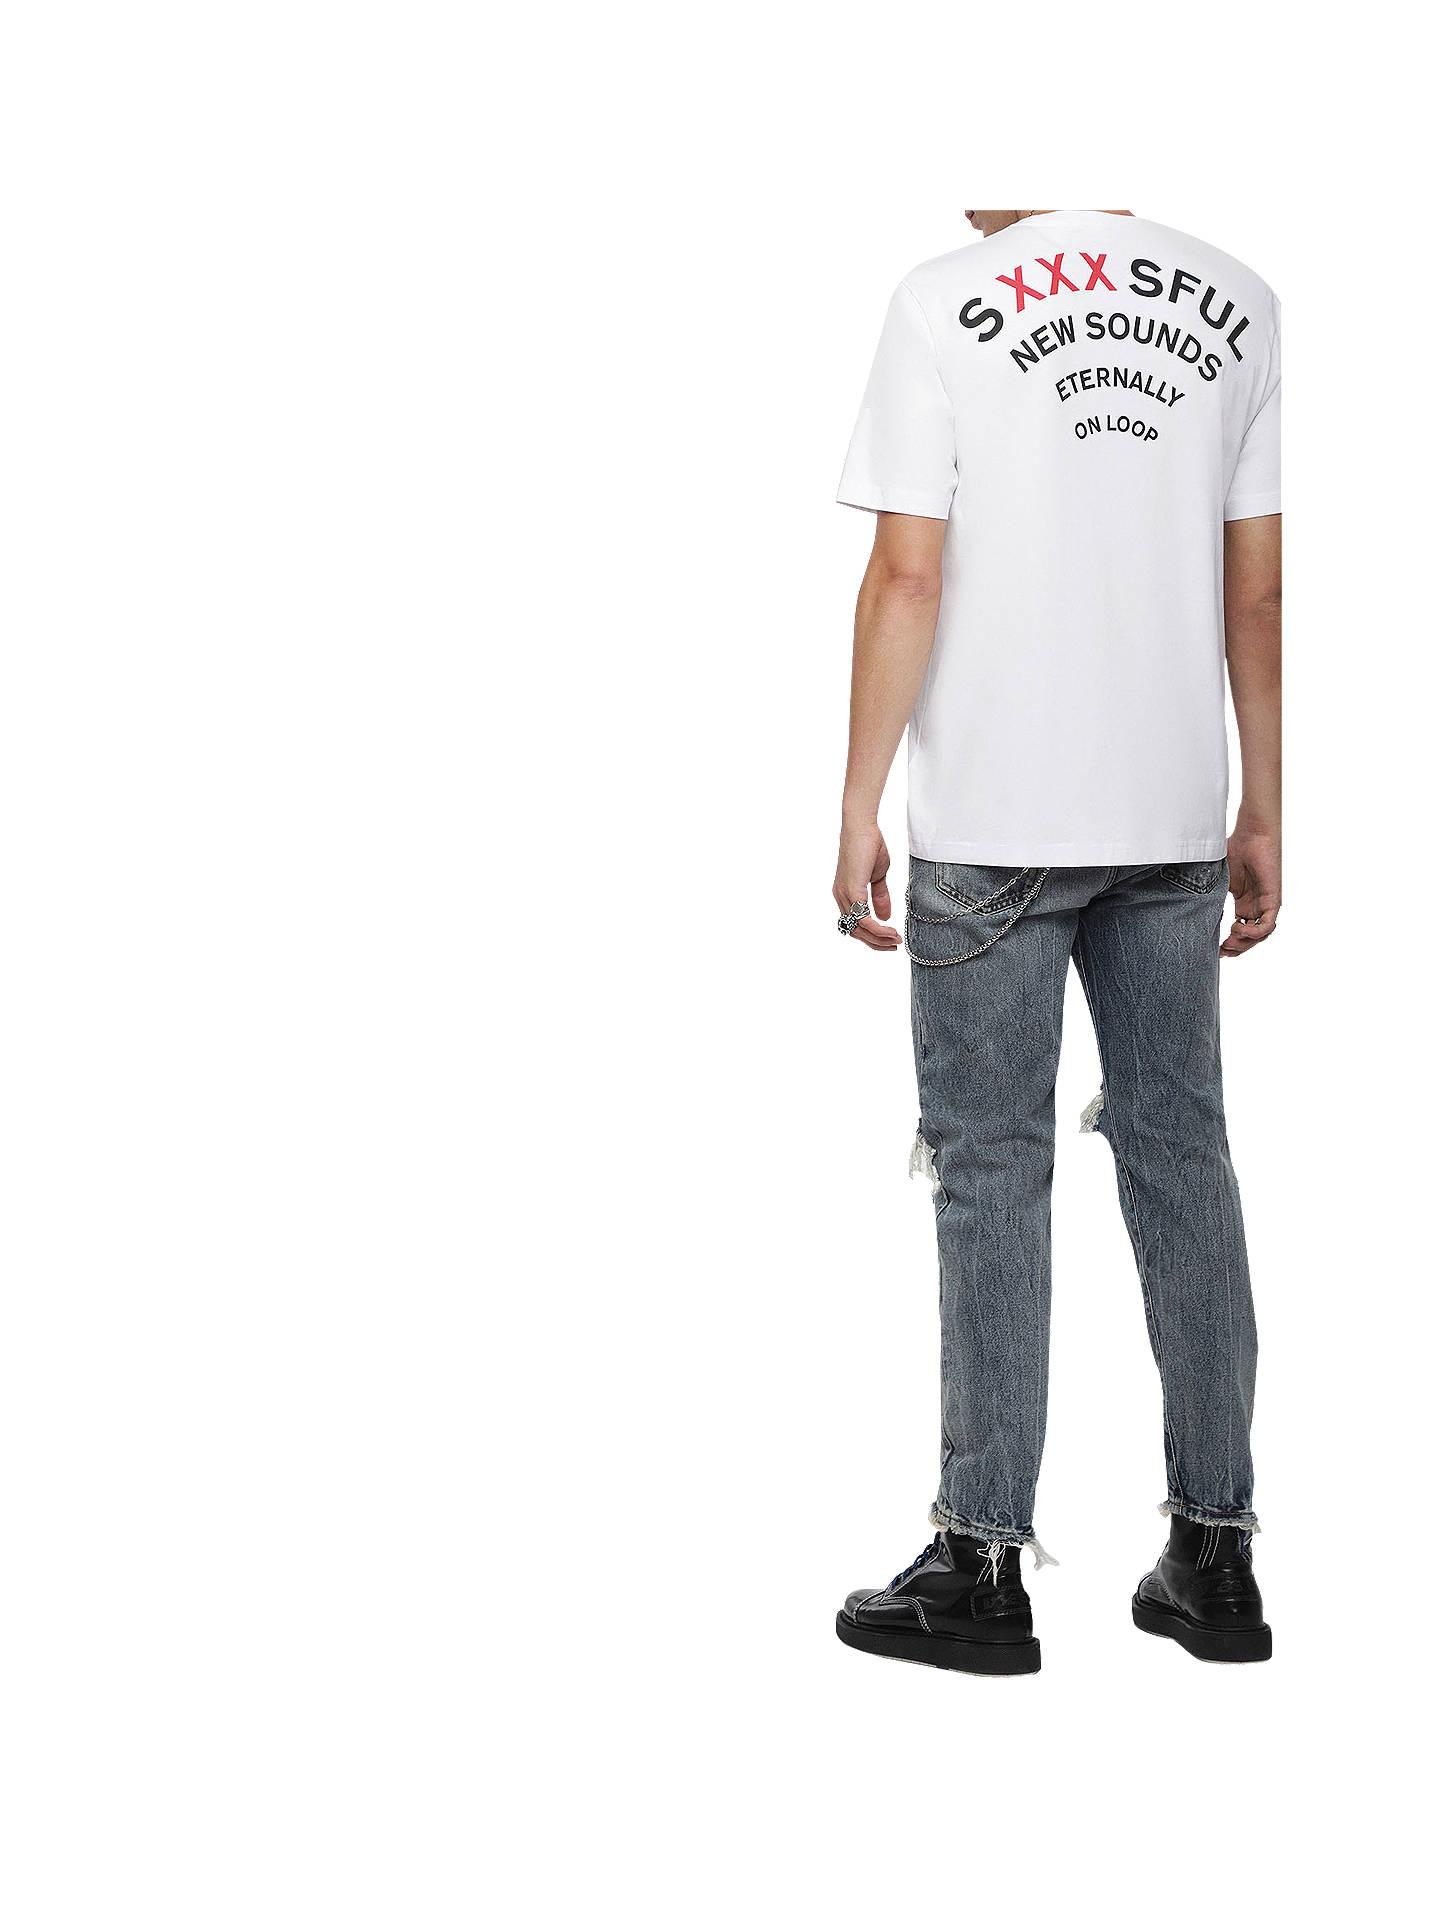 eb722233 ... Buy Diesel T-Just Graphic Print Short Sleeve T-Shirt, White, M ...